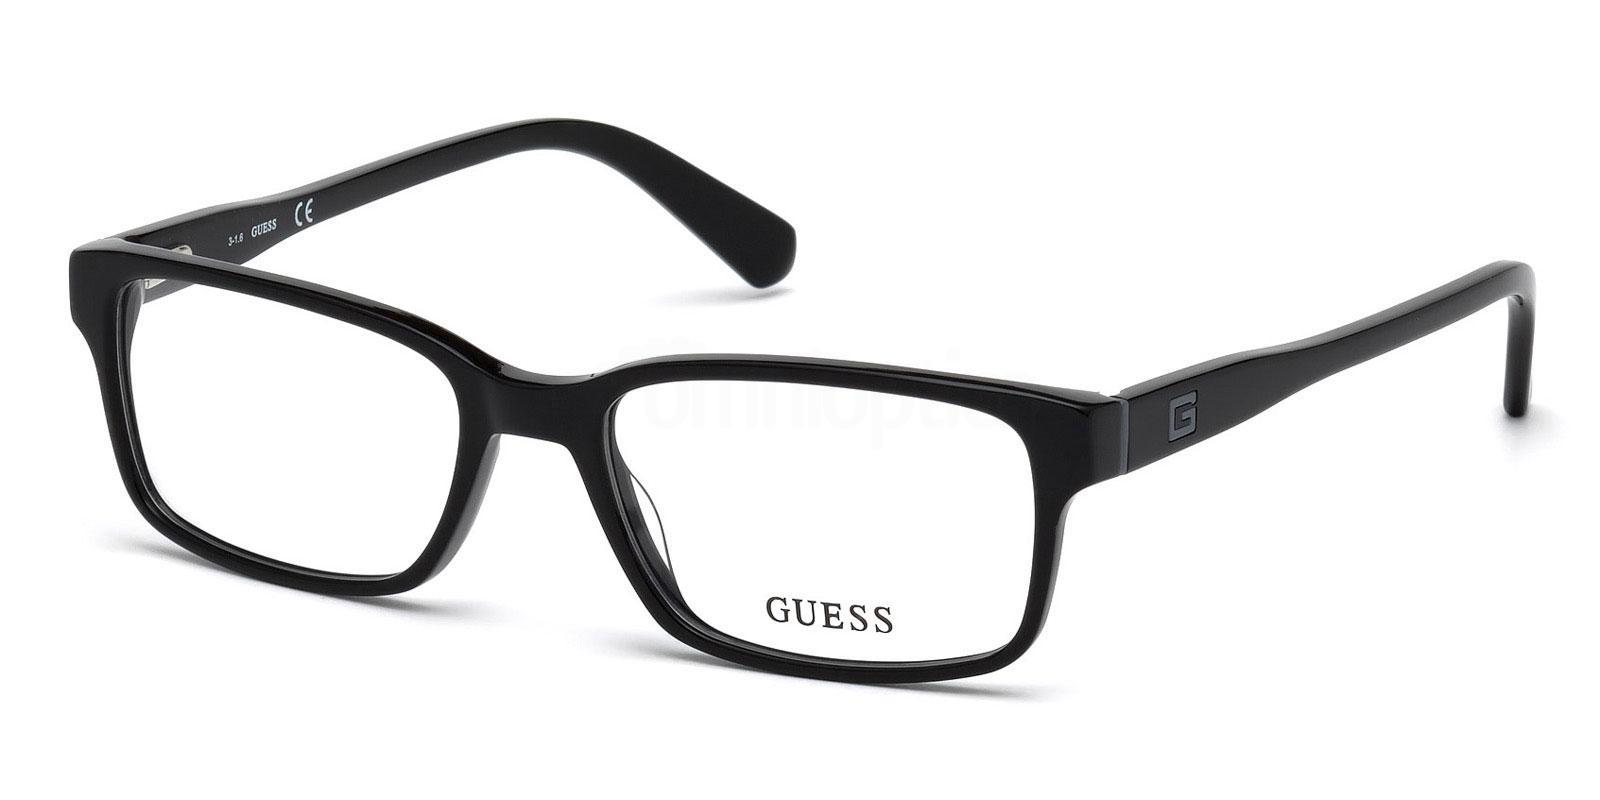 001 GU1906 , Guess